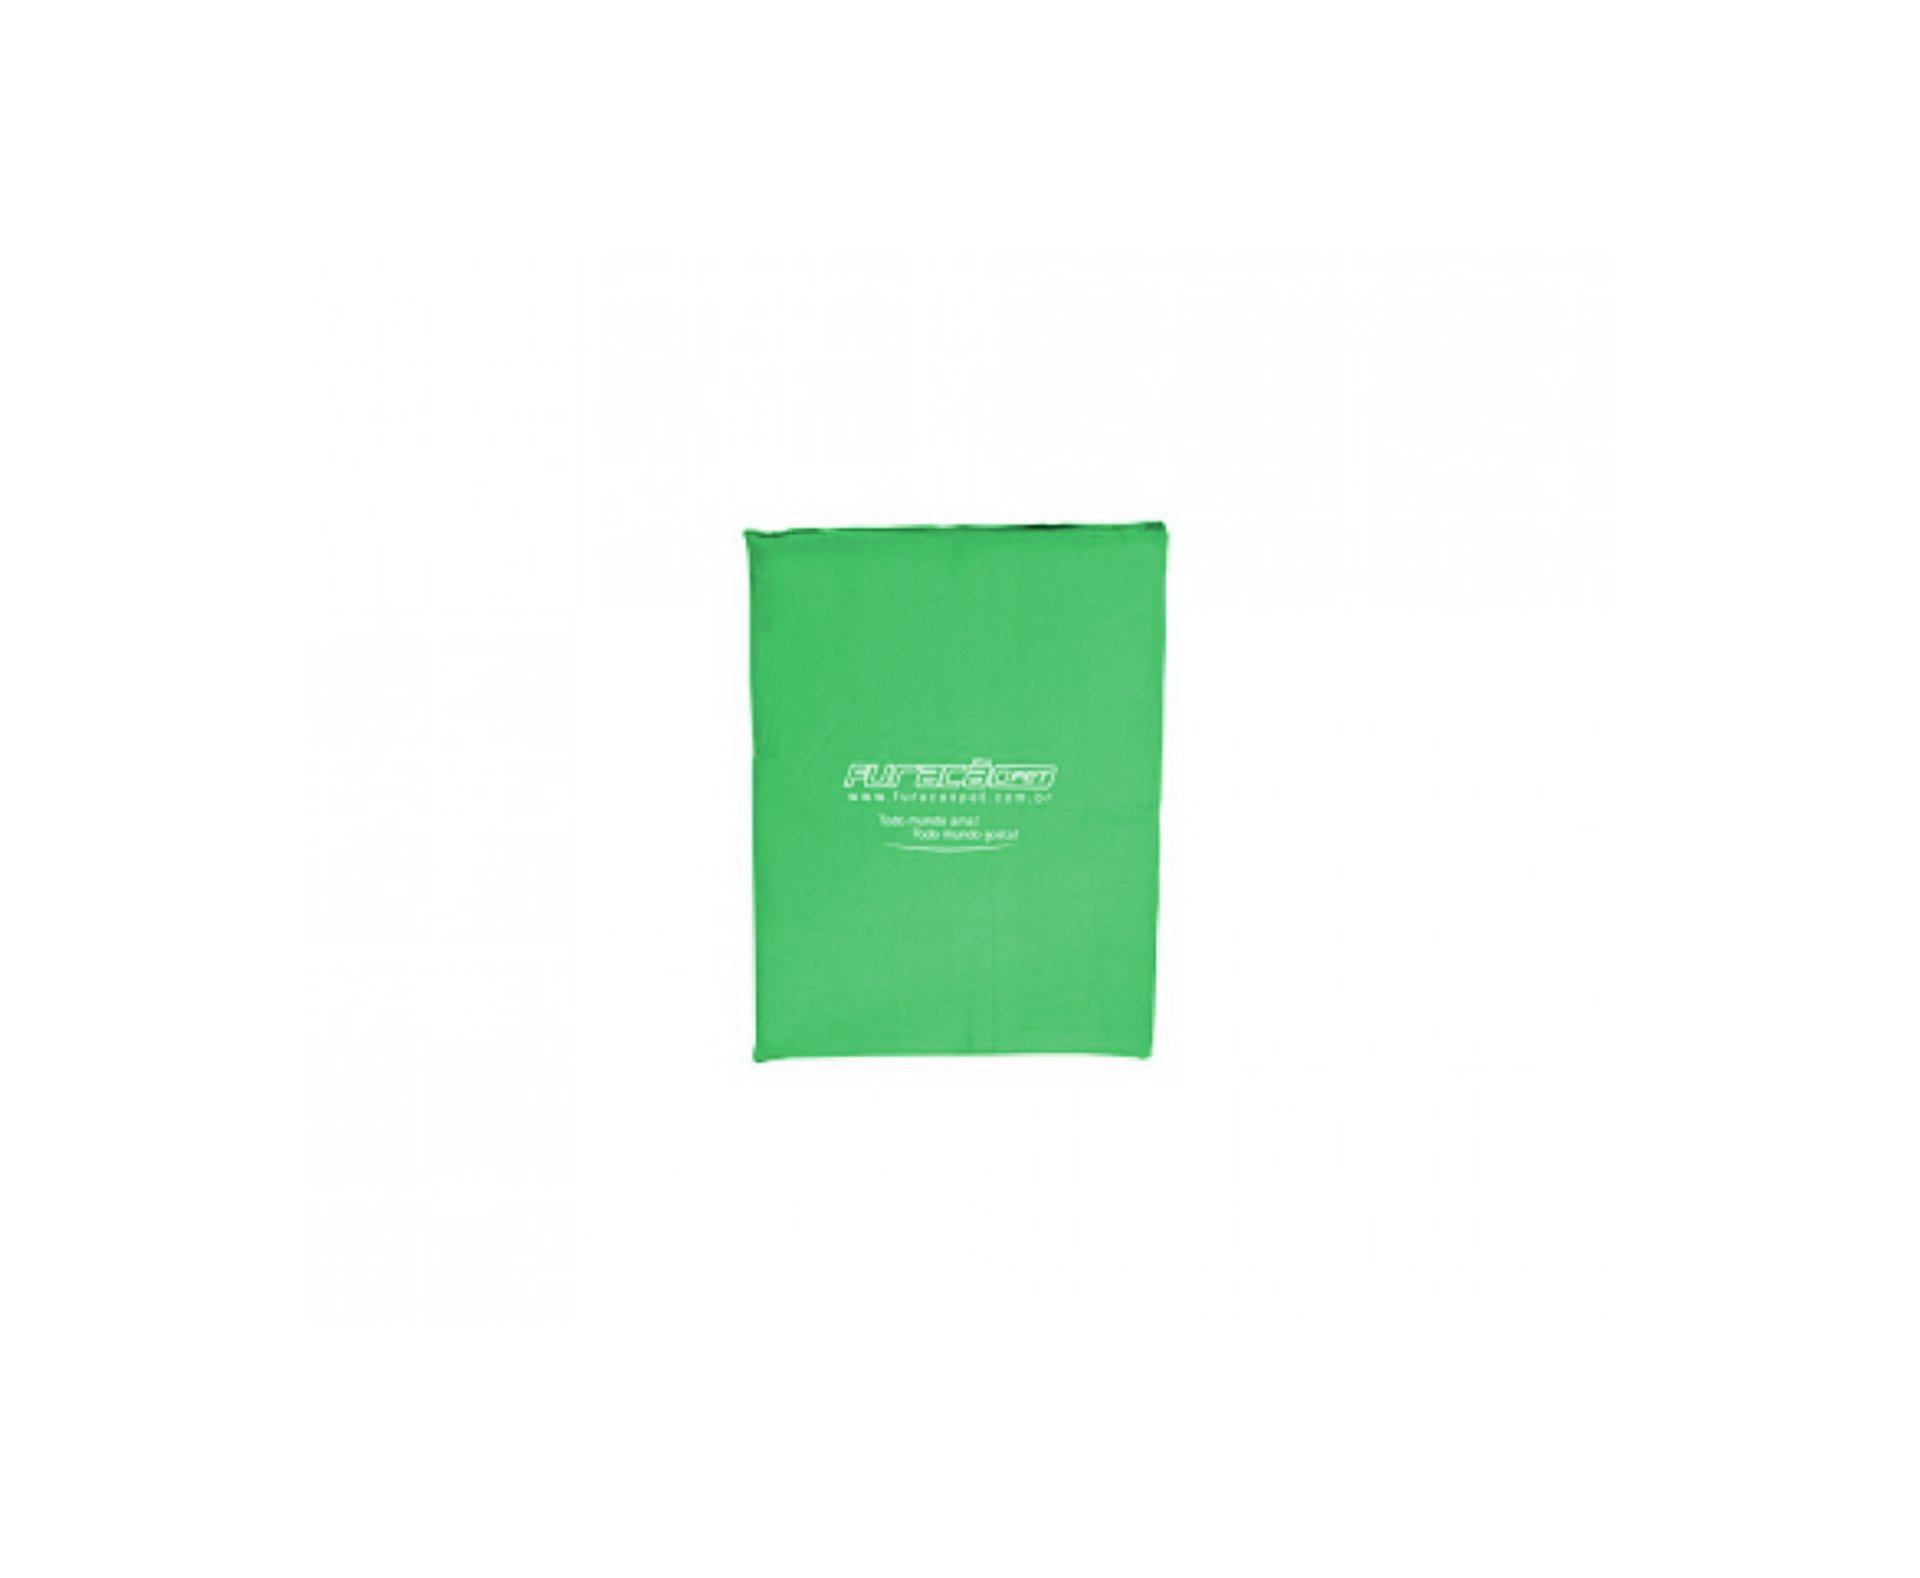 Colchonete Furacãopet N2 Verde - M - Furacão